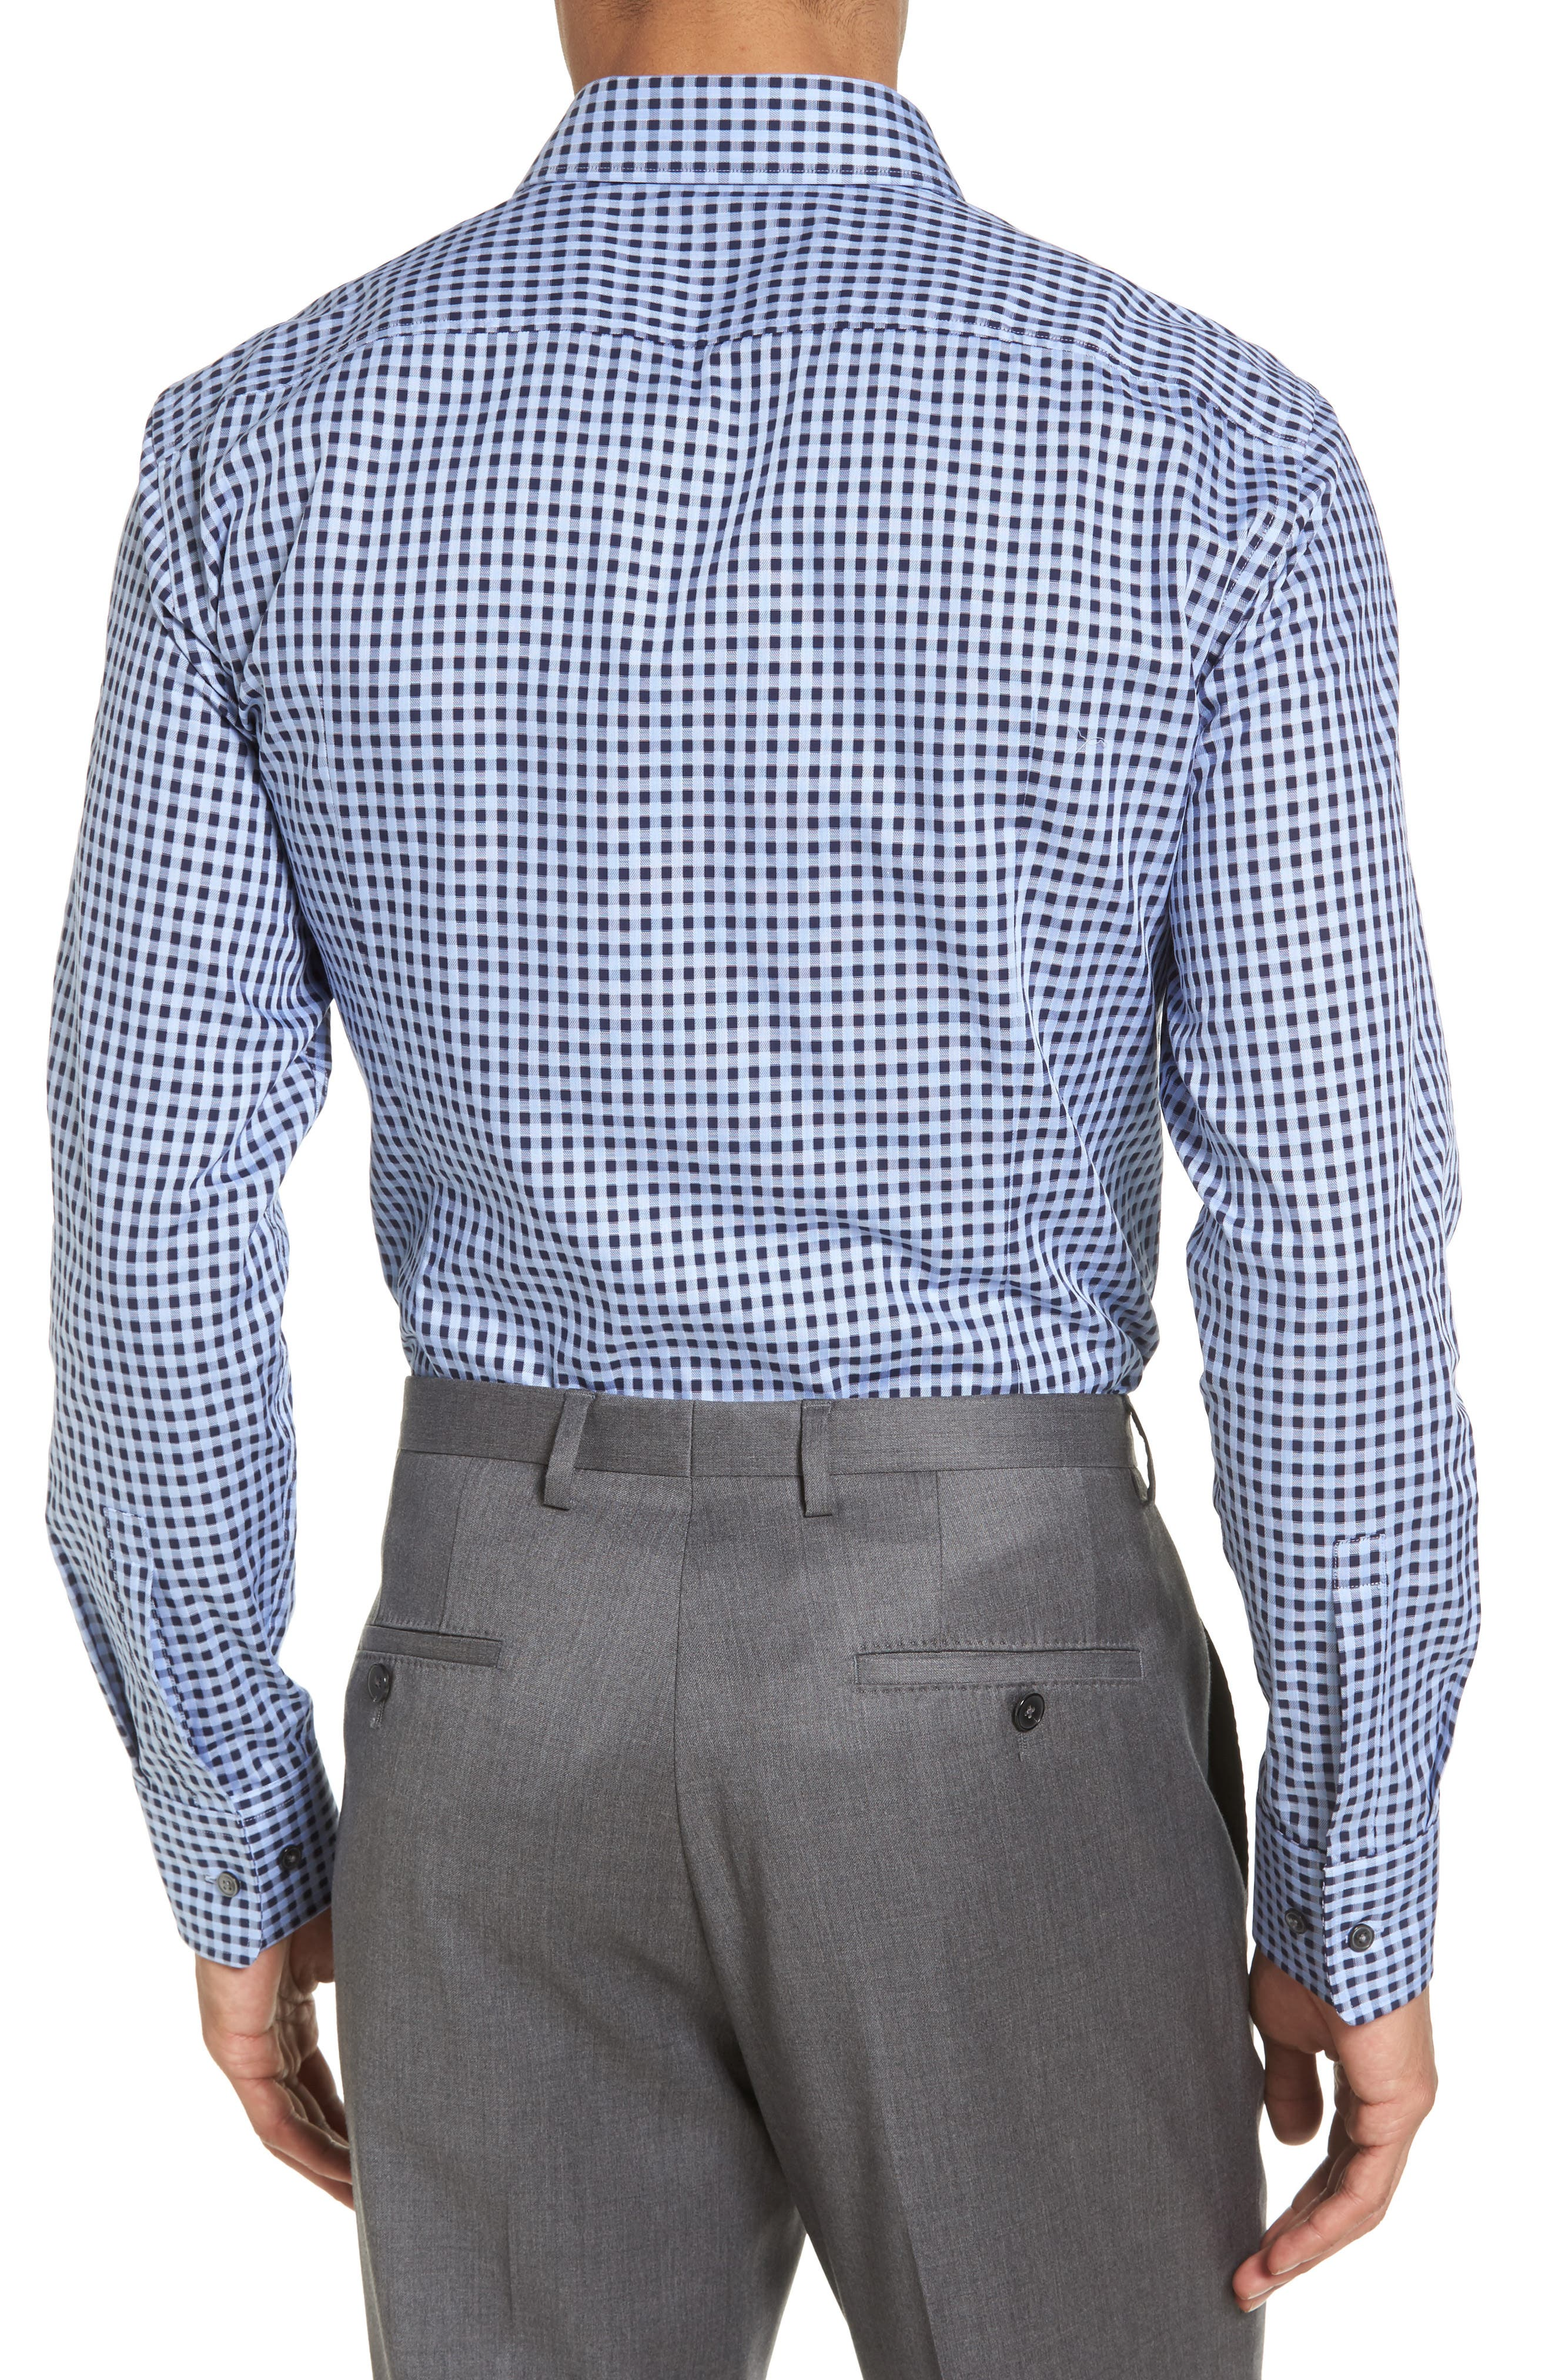 Sharp Fit Check Dress Shirt,                             Alternate thumbnail 2, color,                             410